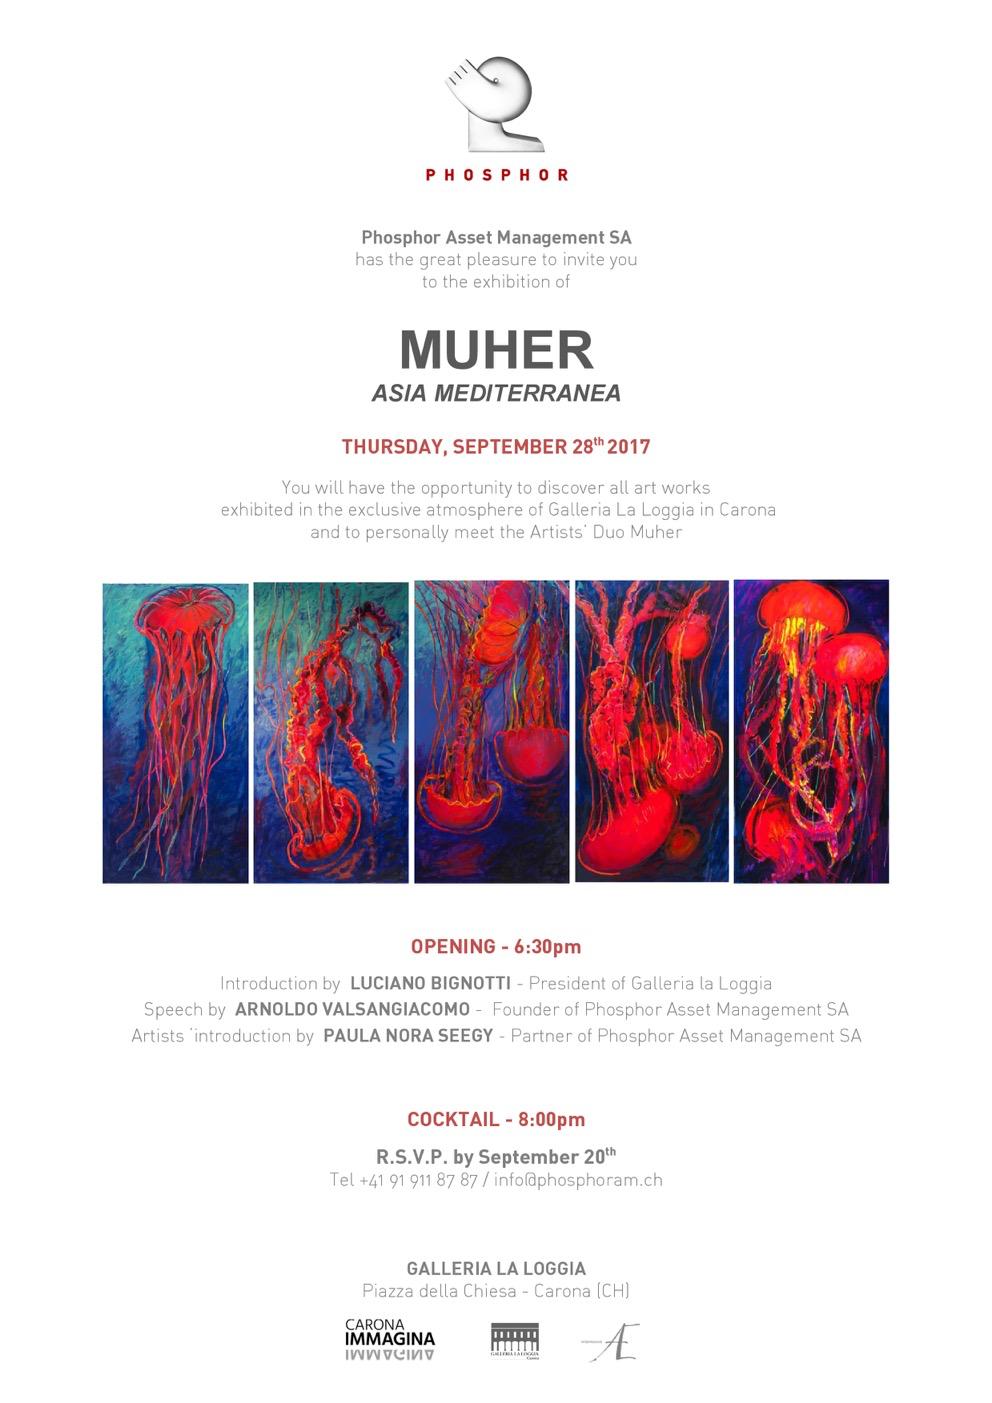 image001 Muher expone —Asia Mediterránea— en Lugano, para PHOSPHOR ASSET MANAGEMENT